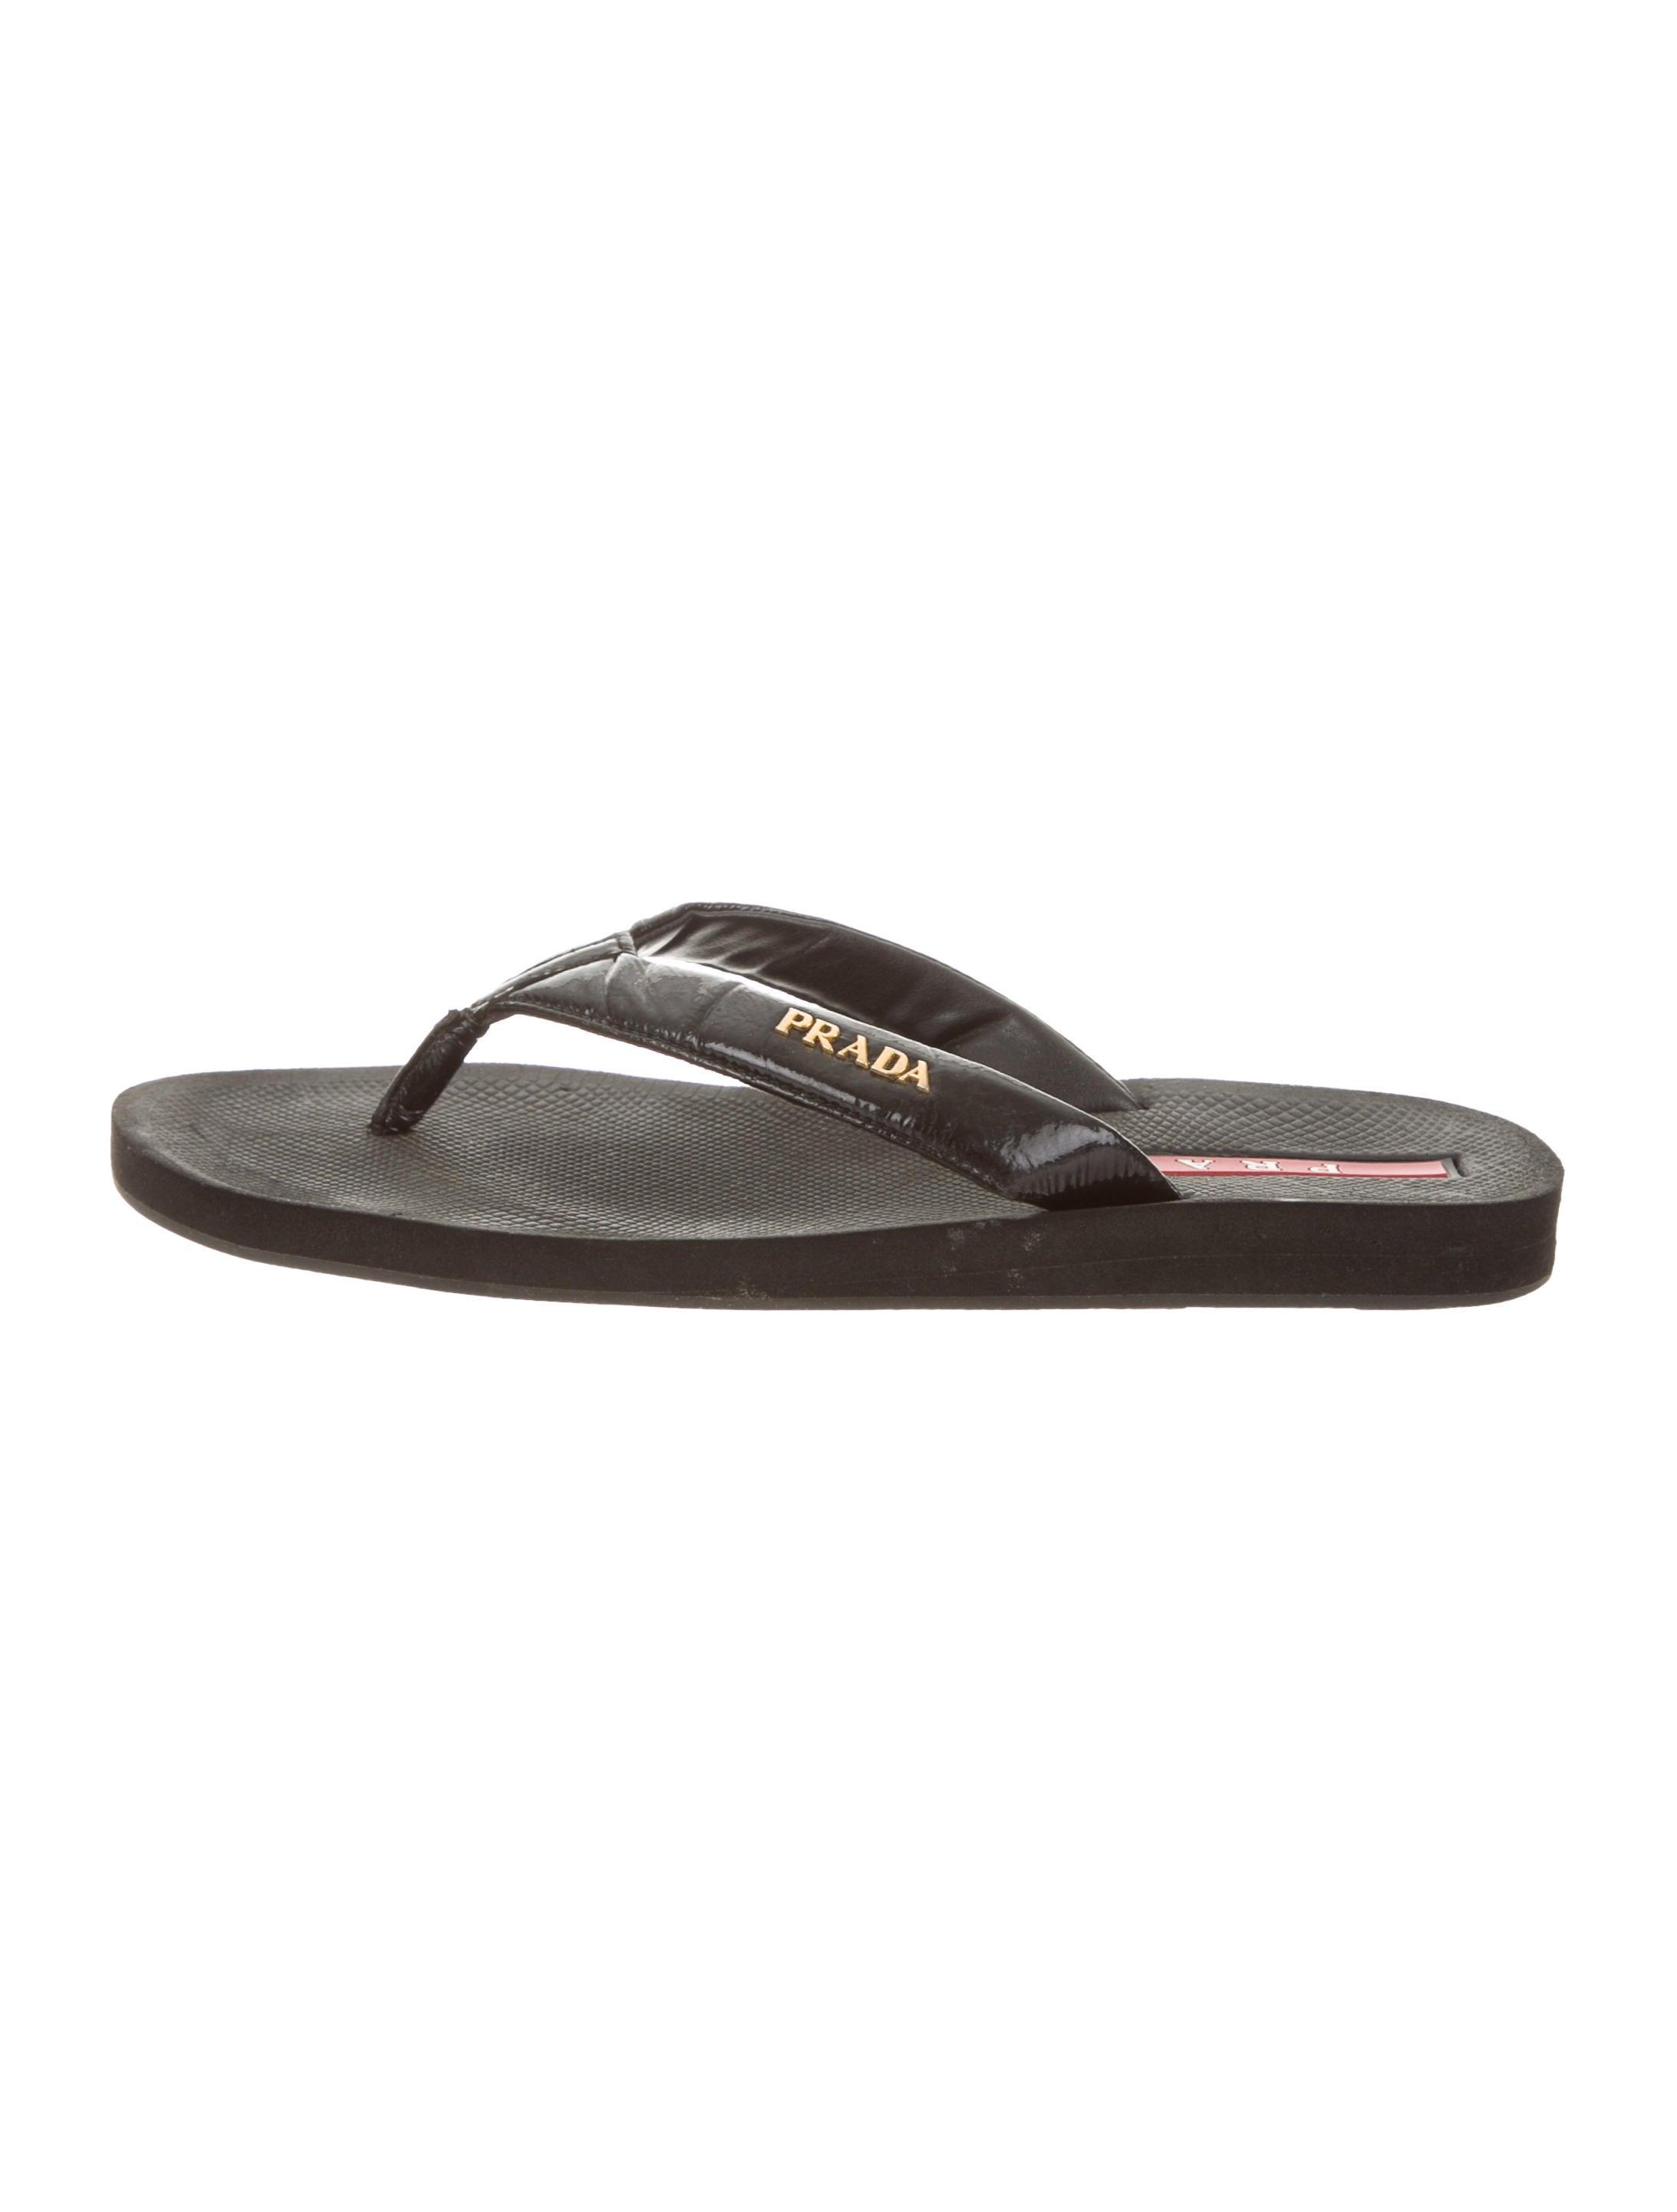 57aa41446 Prada Sport Logo Thong Sandals - Shoes - WPR50584